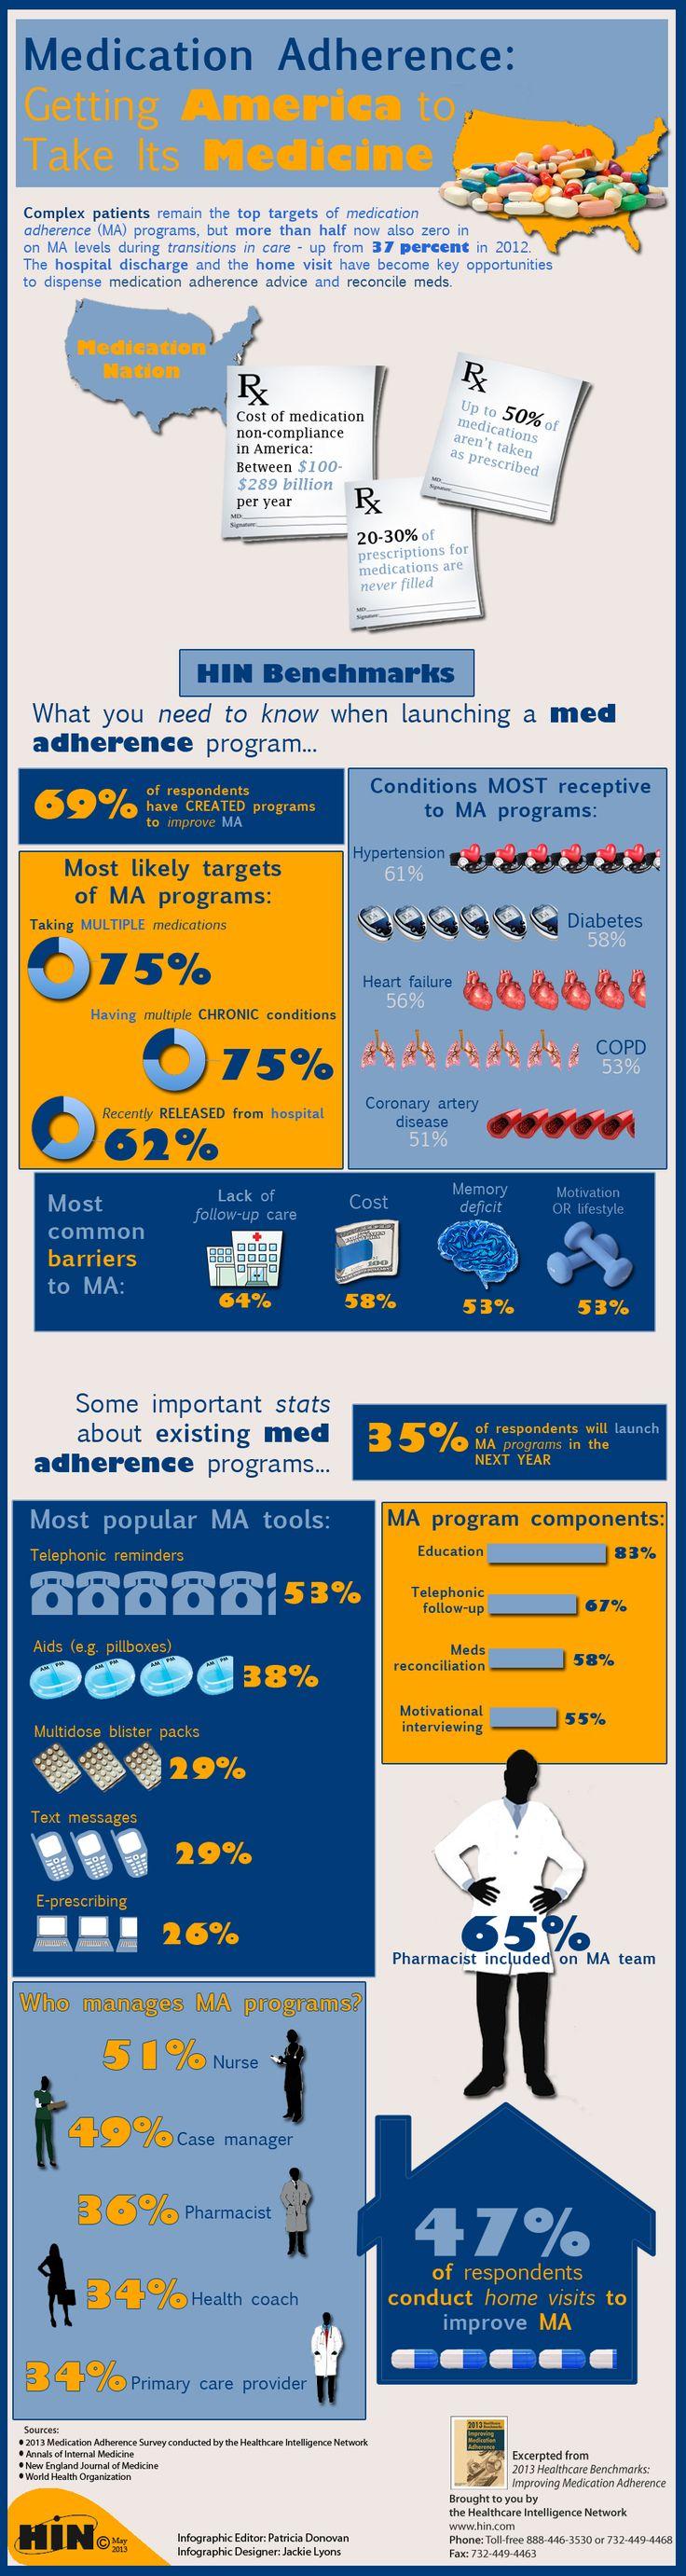 Medication Adherence in US